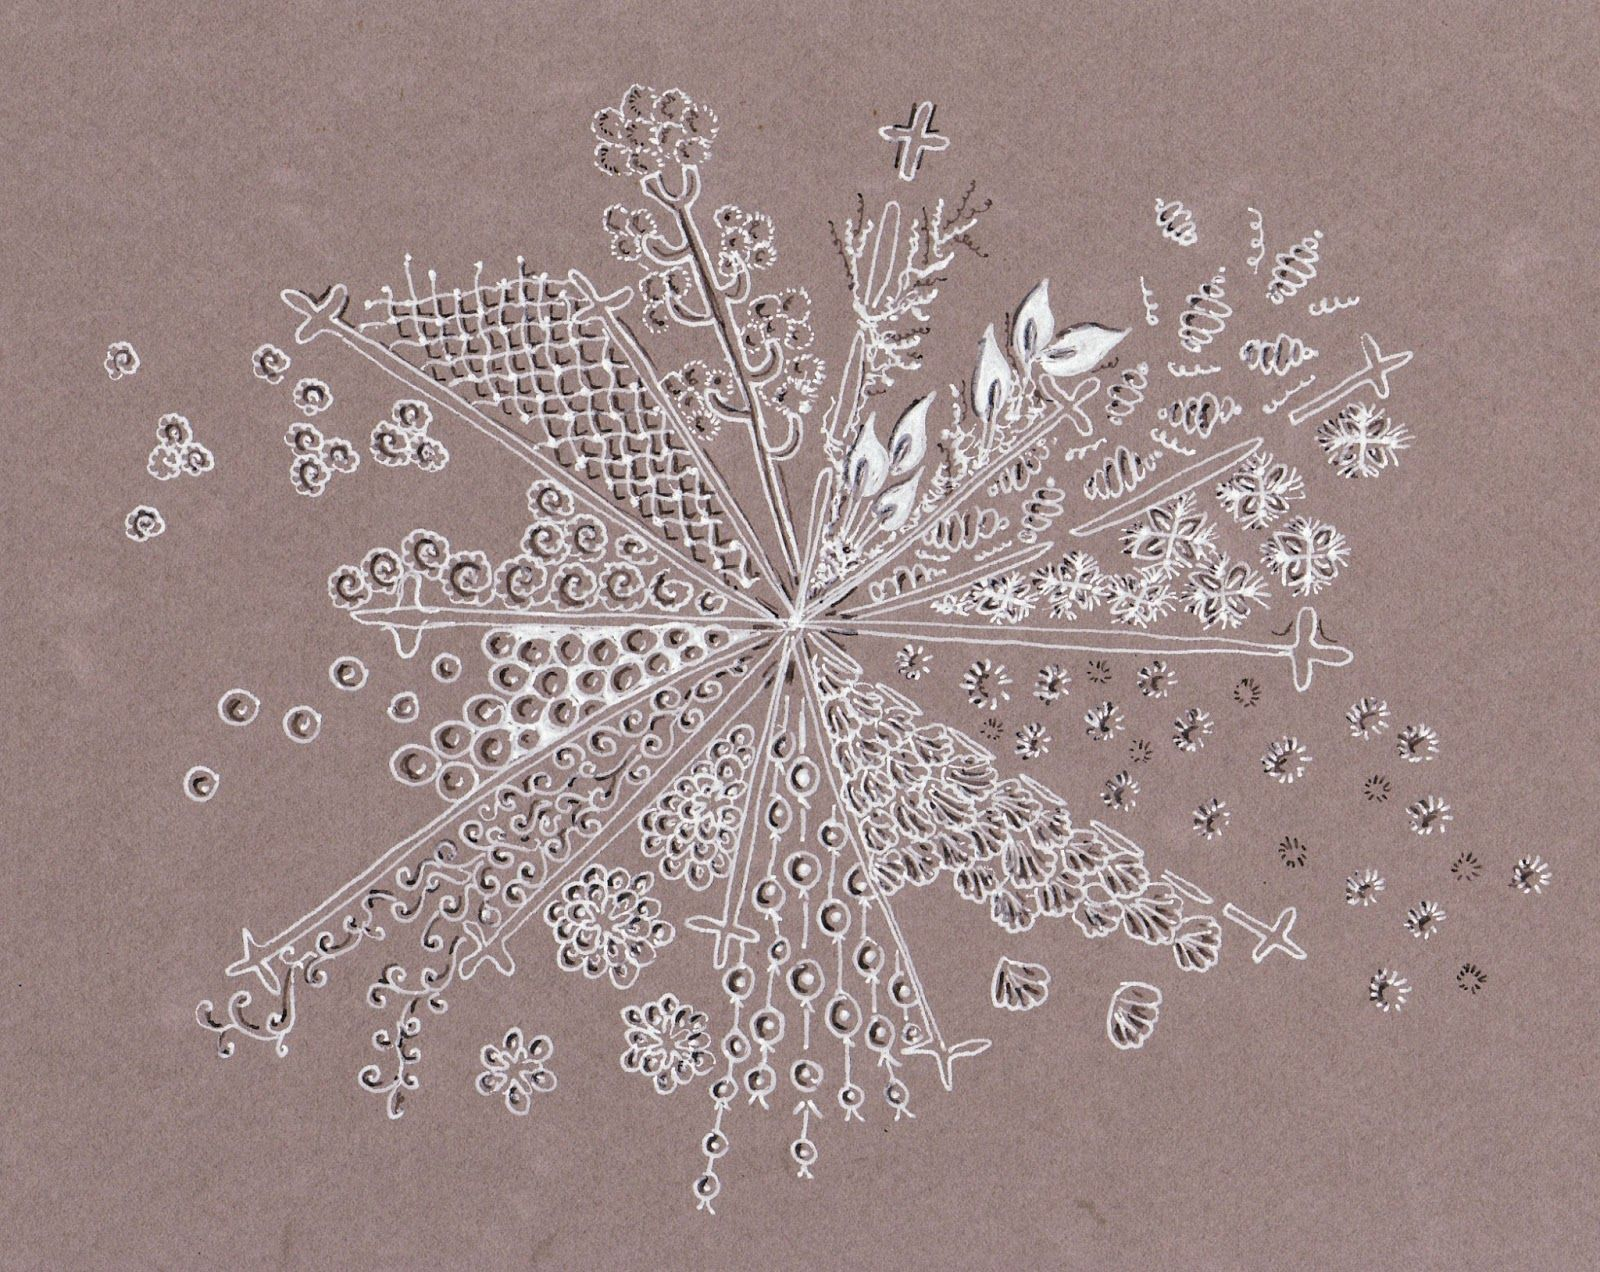 Efie Goes Zentangle Art Tangle Club Sneeuwvlok Sneeuwvlokken Zentangle Patronen Zentangle